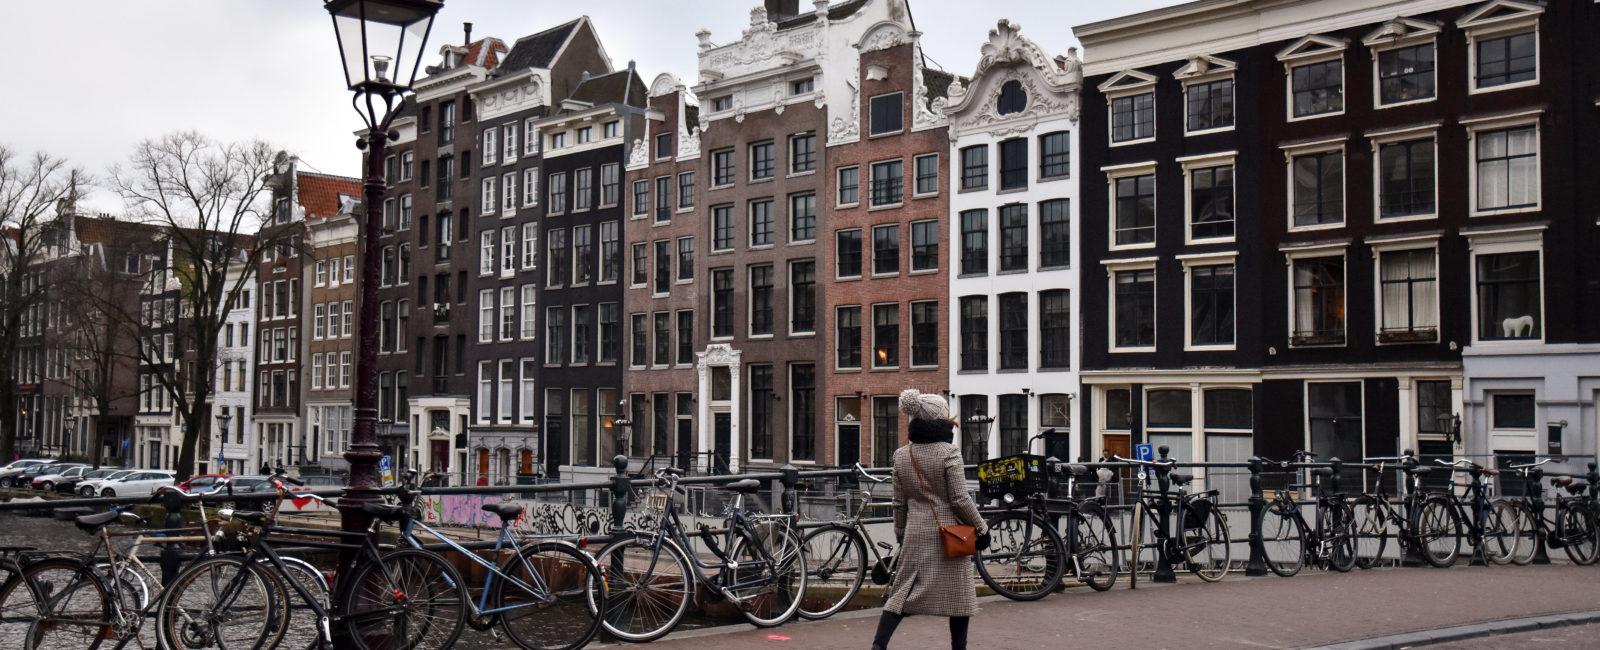 Un week-end à Amsterdam en mars